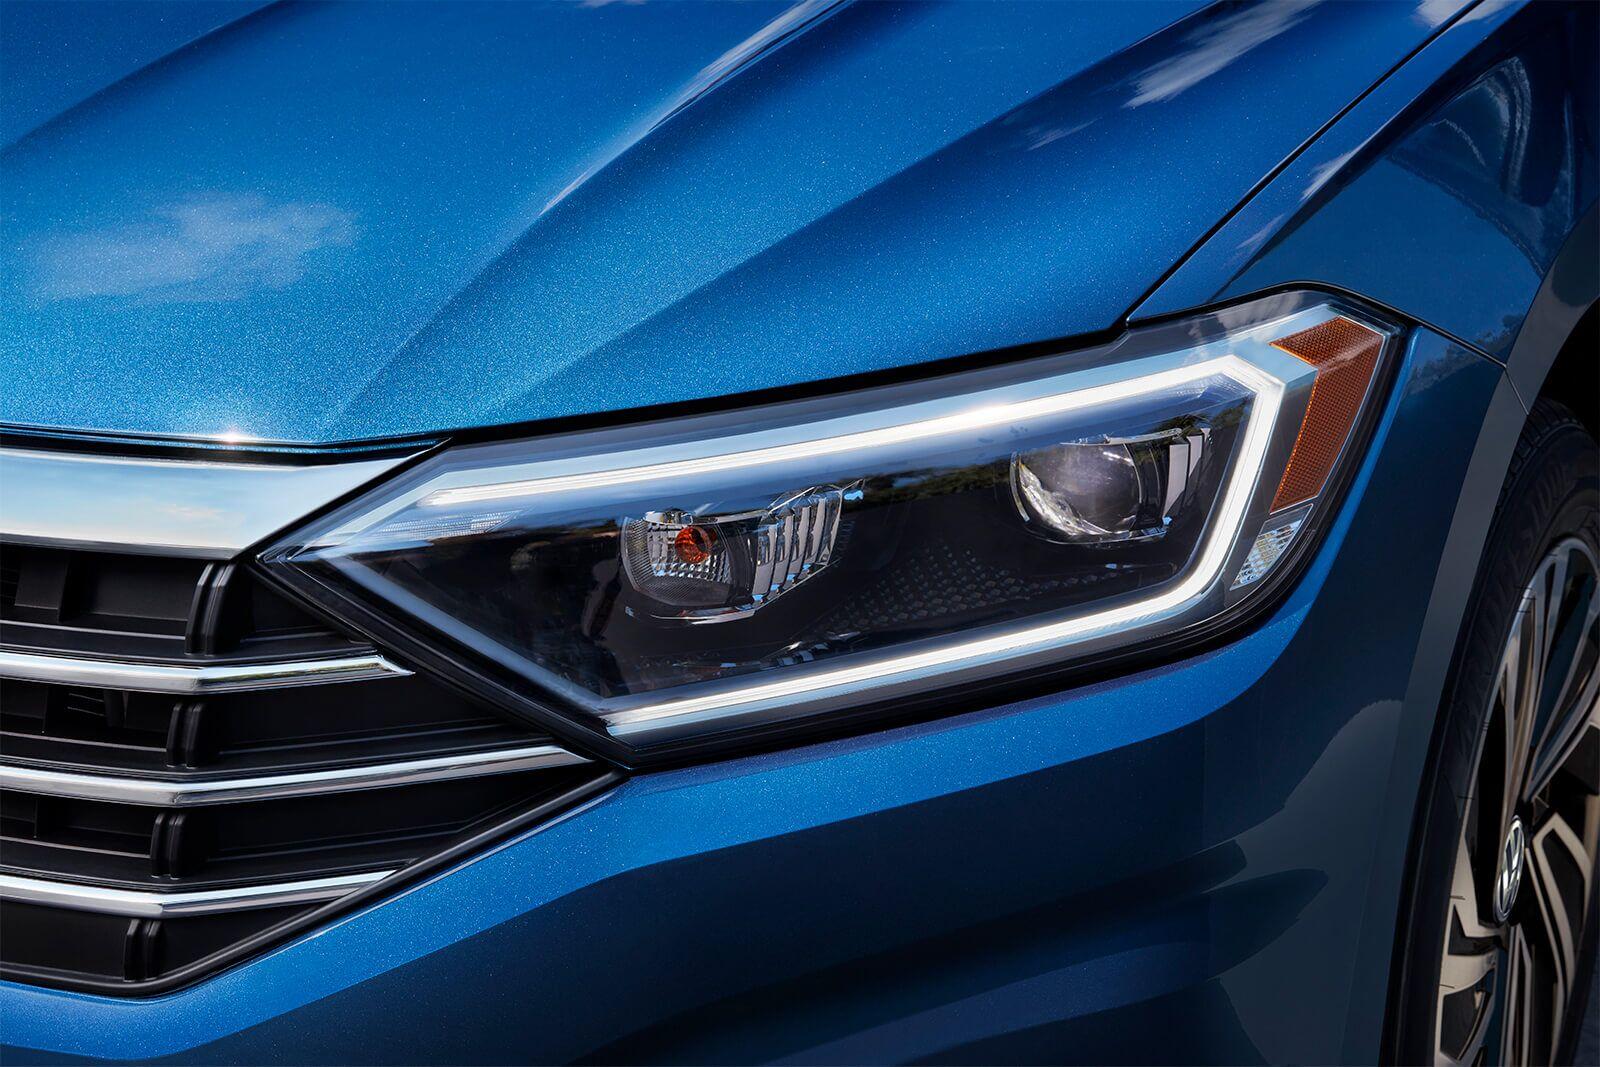 New 2019 Volkswagen Jetta LED headlights